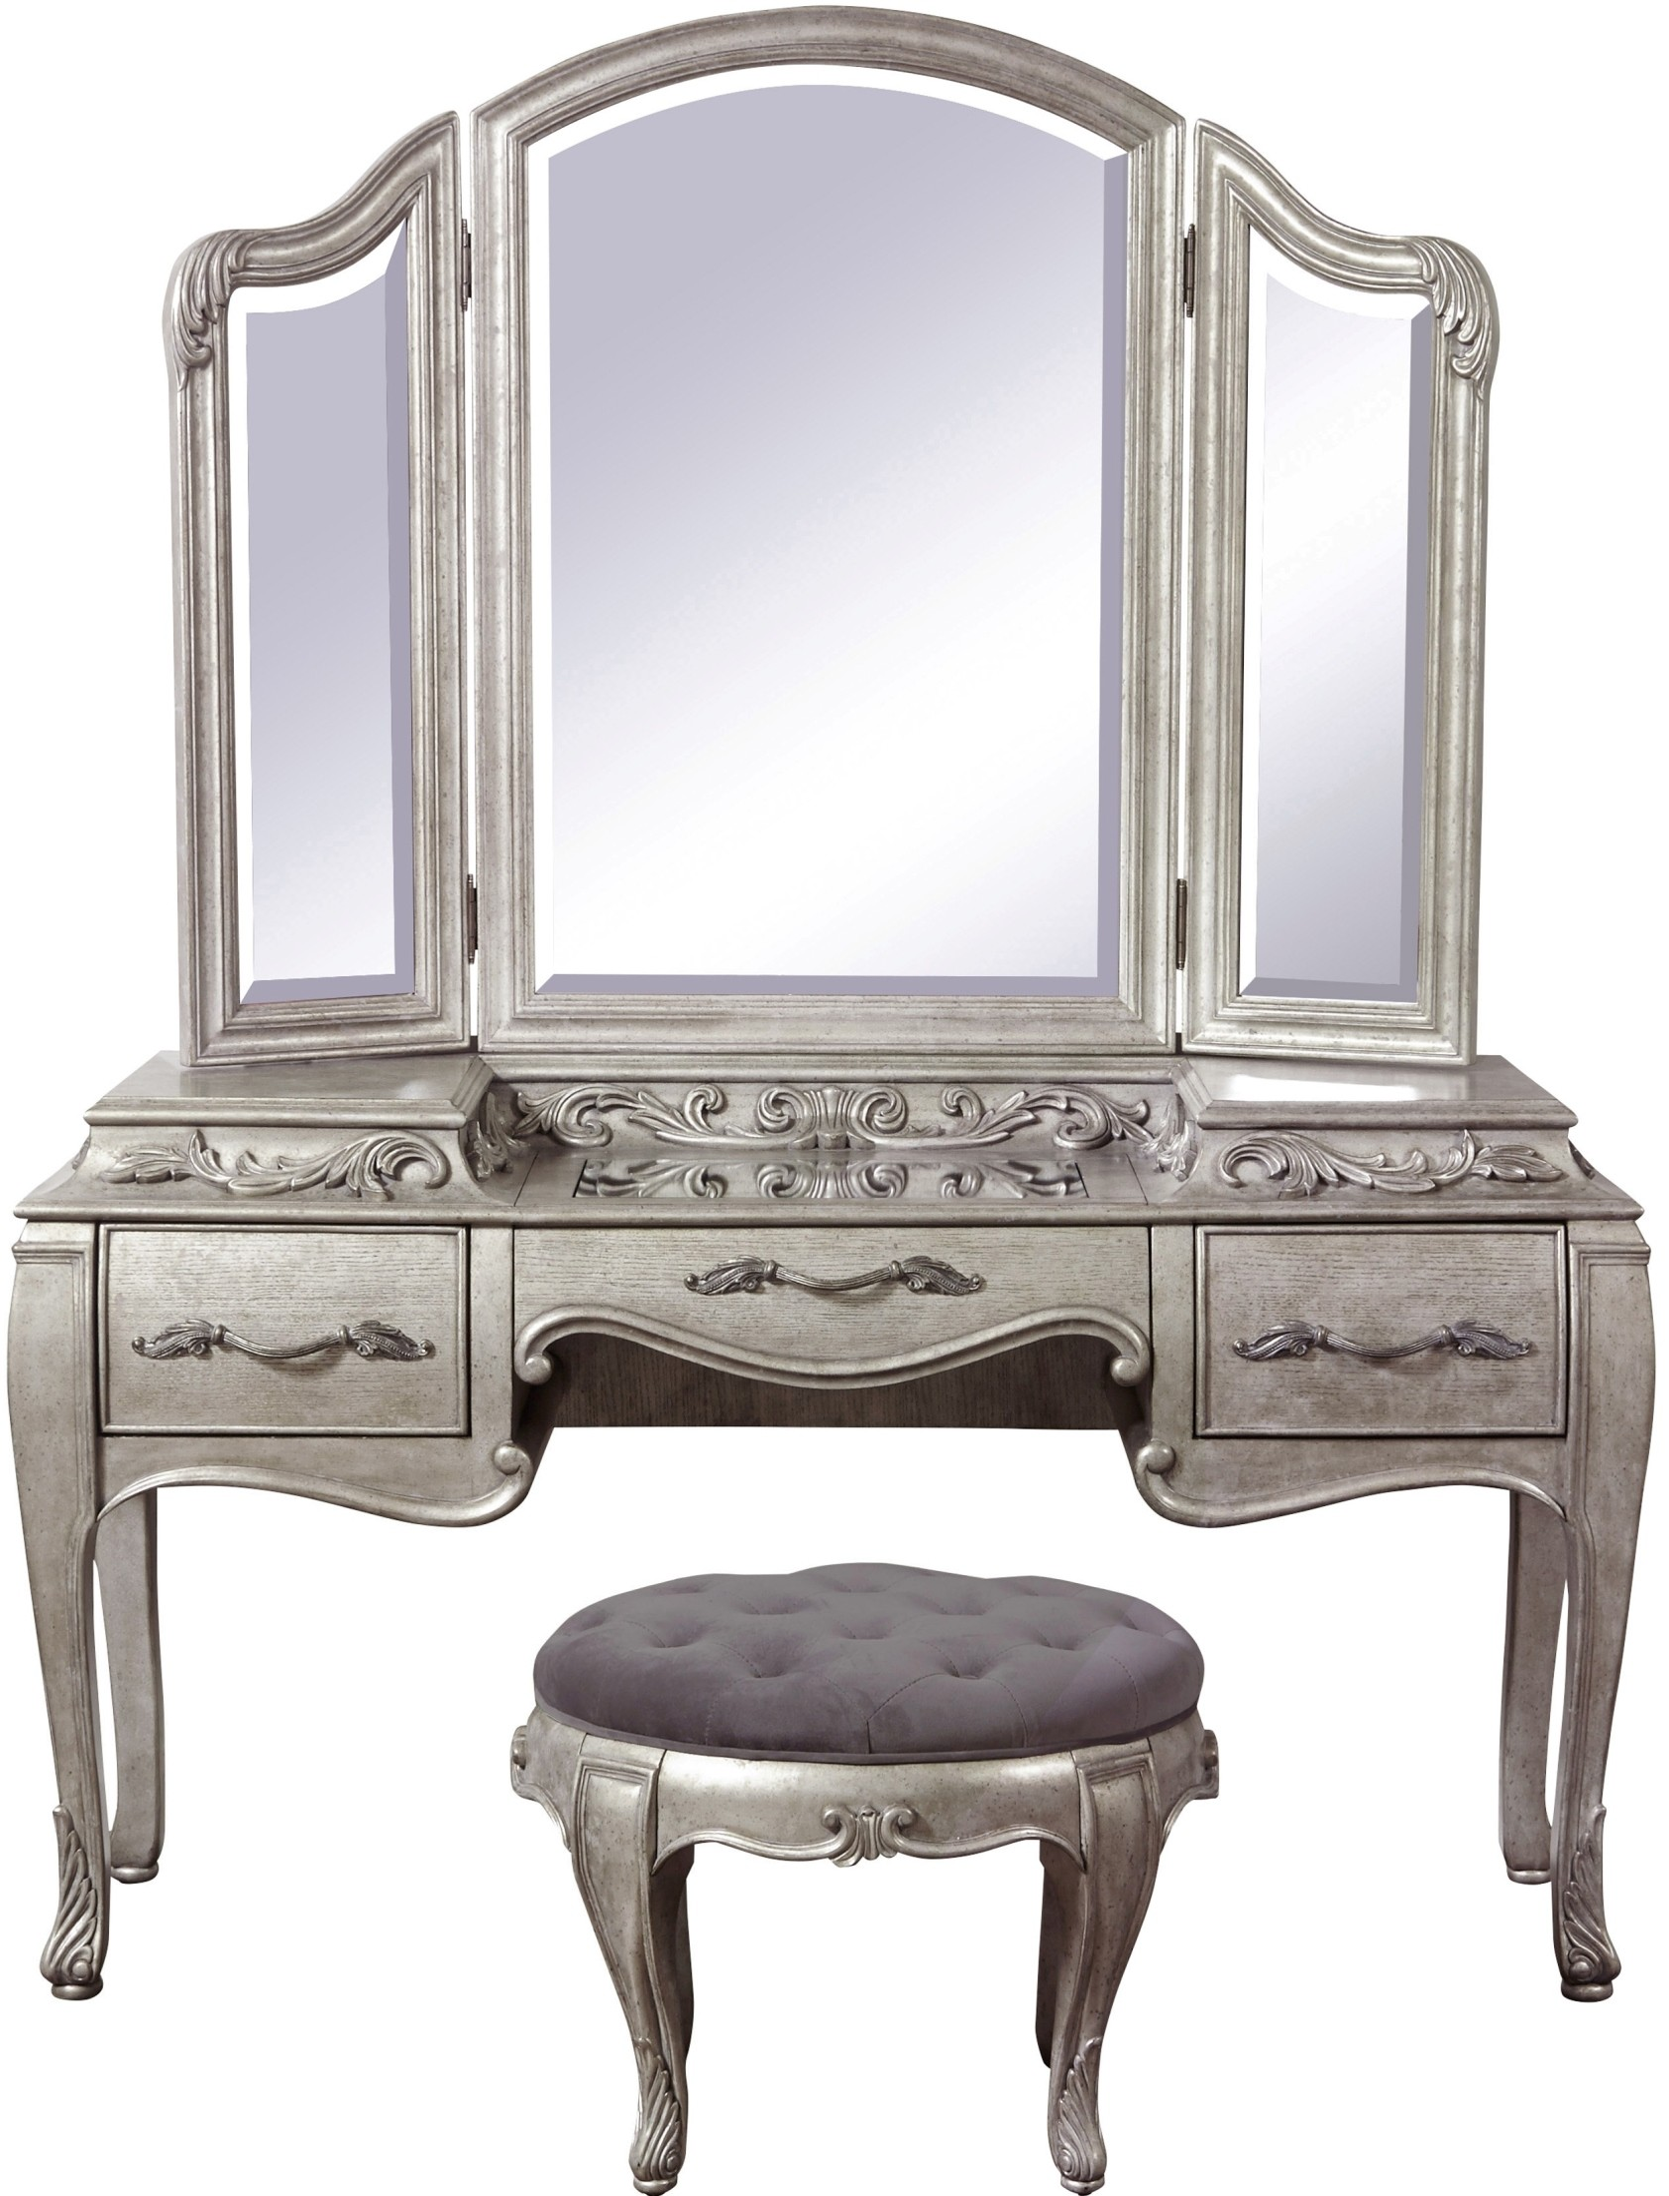 Rhianna Silver Patina Upholstered Panel Bedroom Set Media Gallery 11